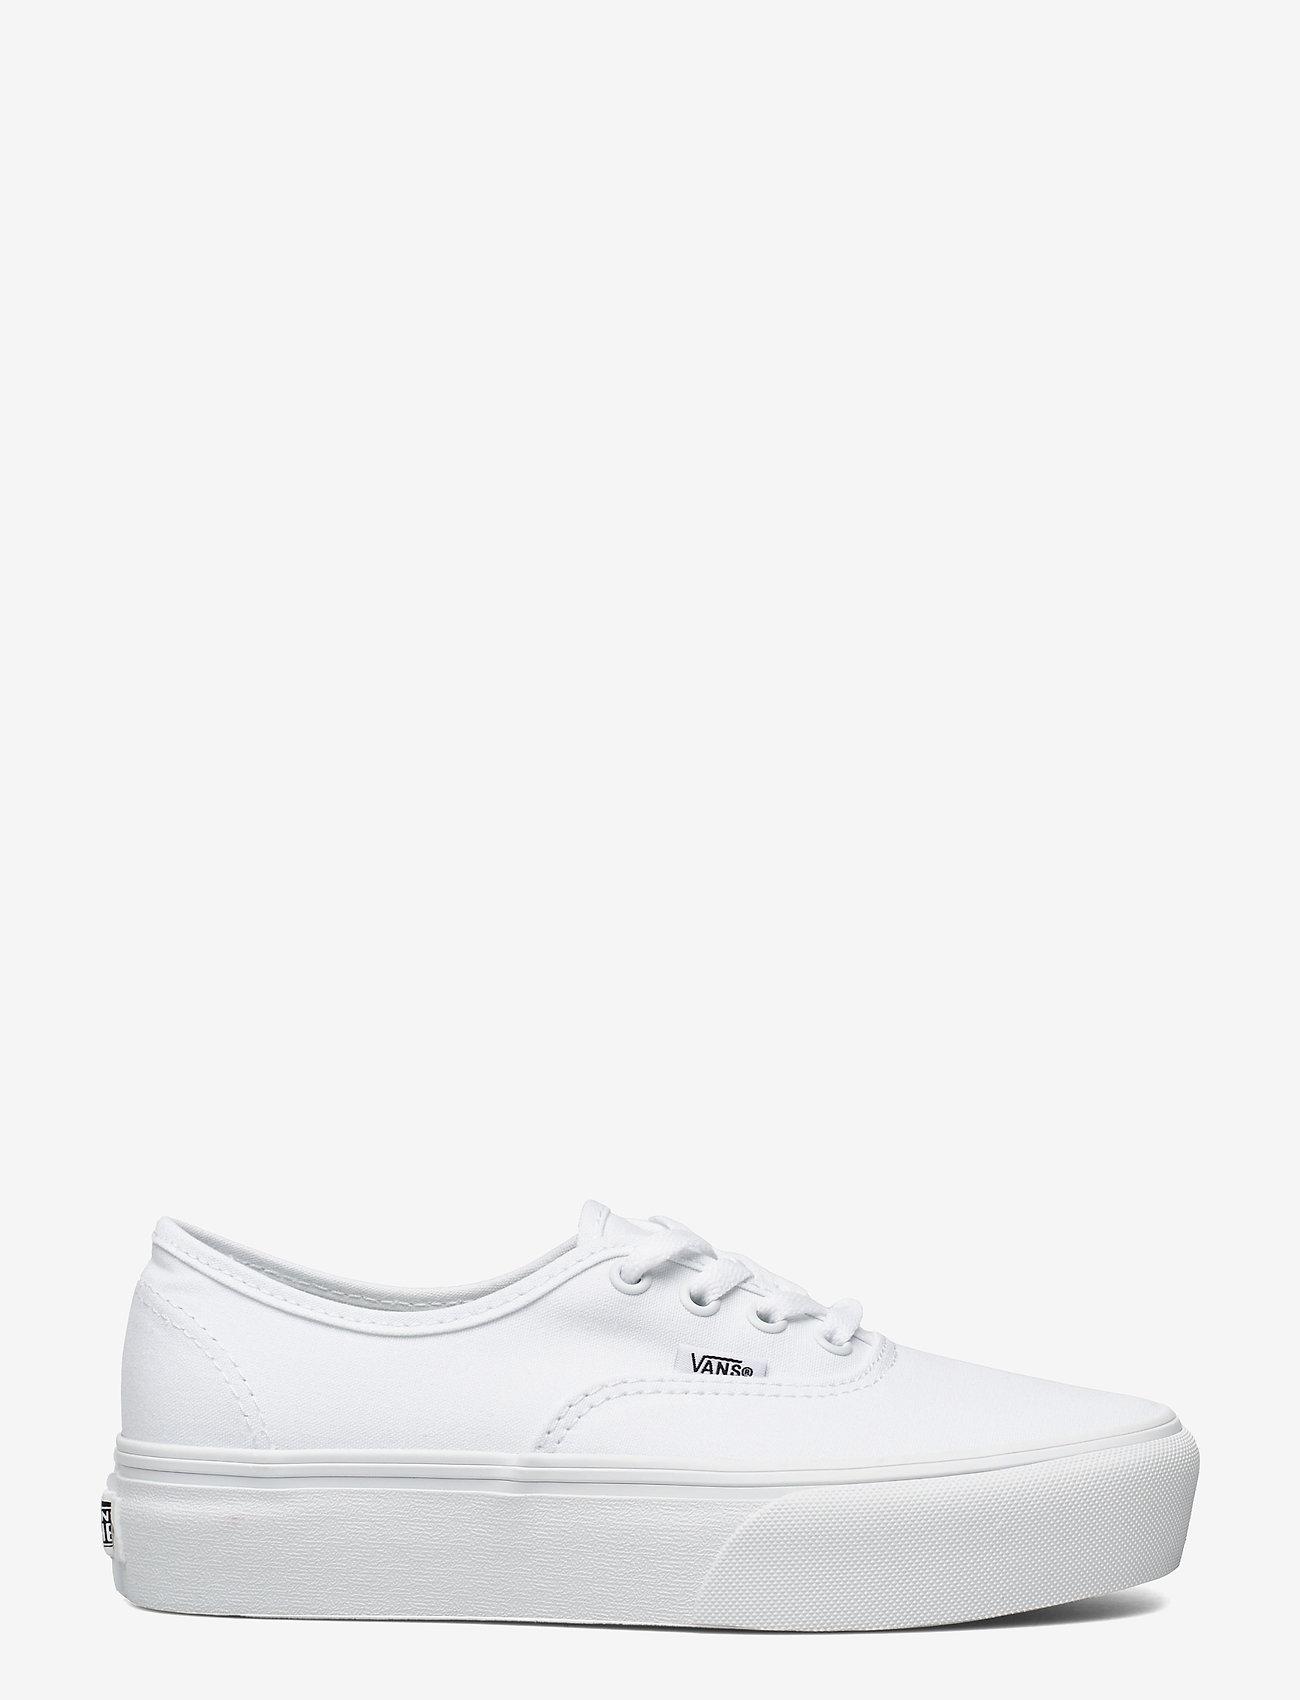 VANS - UA Authentic Platform 2.0 - lage sneakers - true white - 1